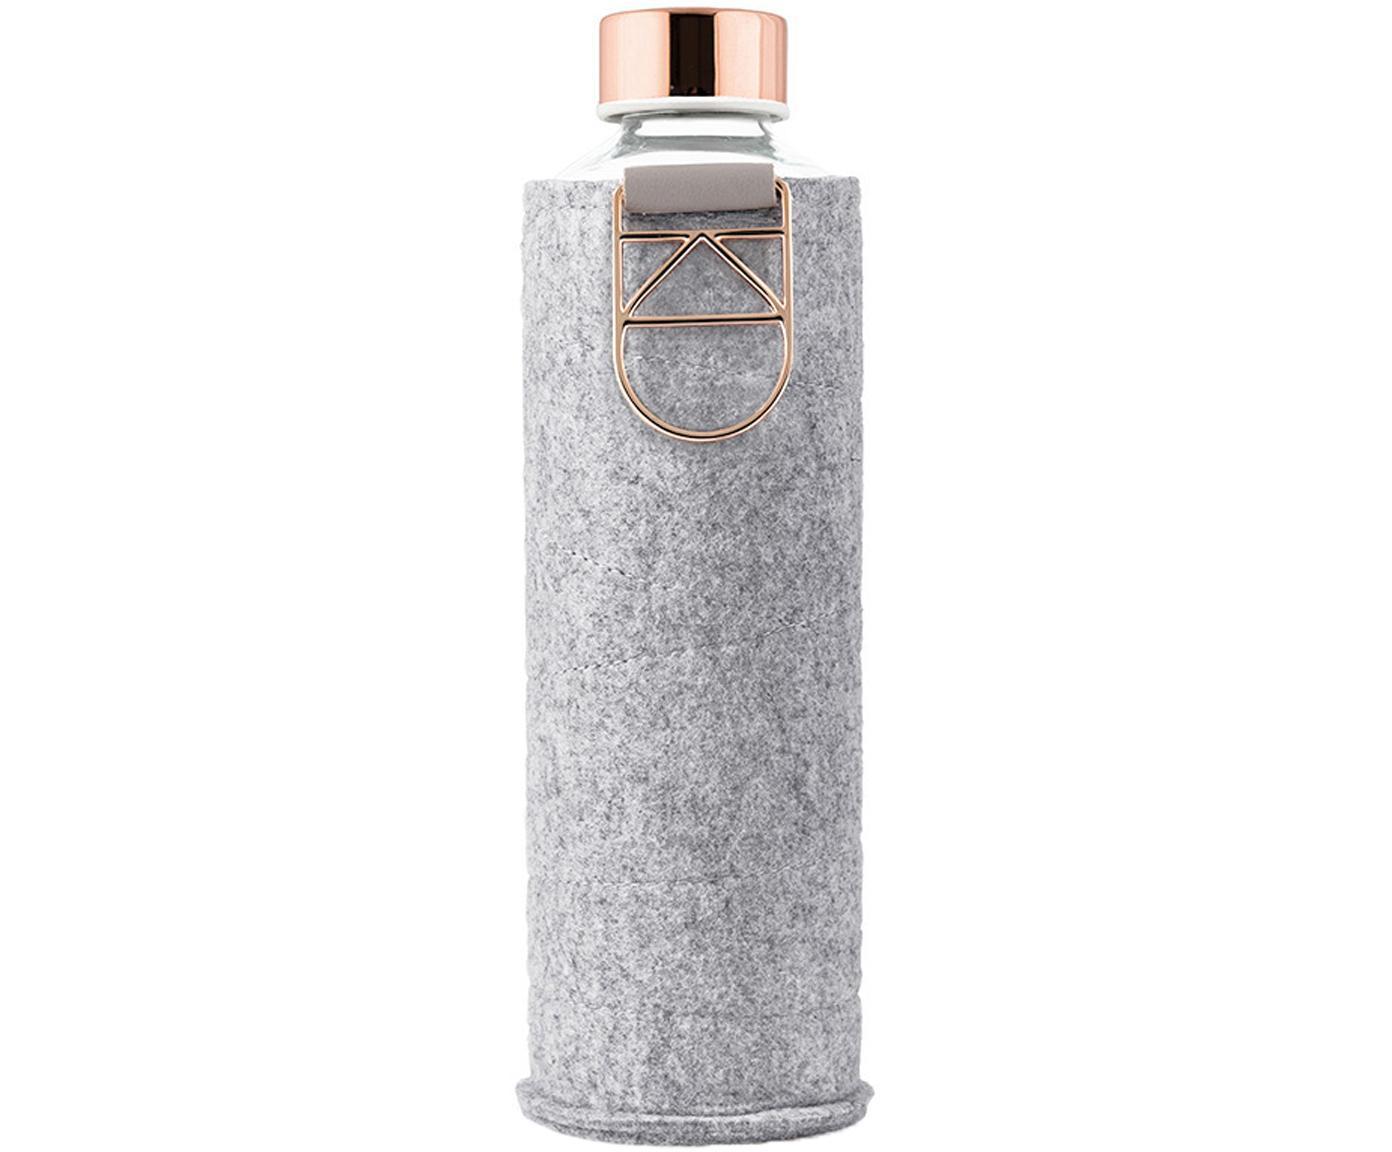 Drinkfles Mismatch, Fles: borosilicaatglas, Deksel: edelstaal, tritan (kunsts, Grijs, transparant, koperkleurig, Ø 8 x H 26 cm